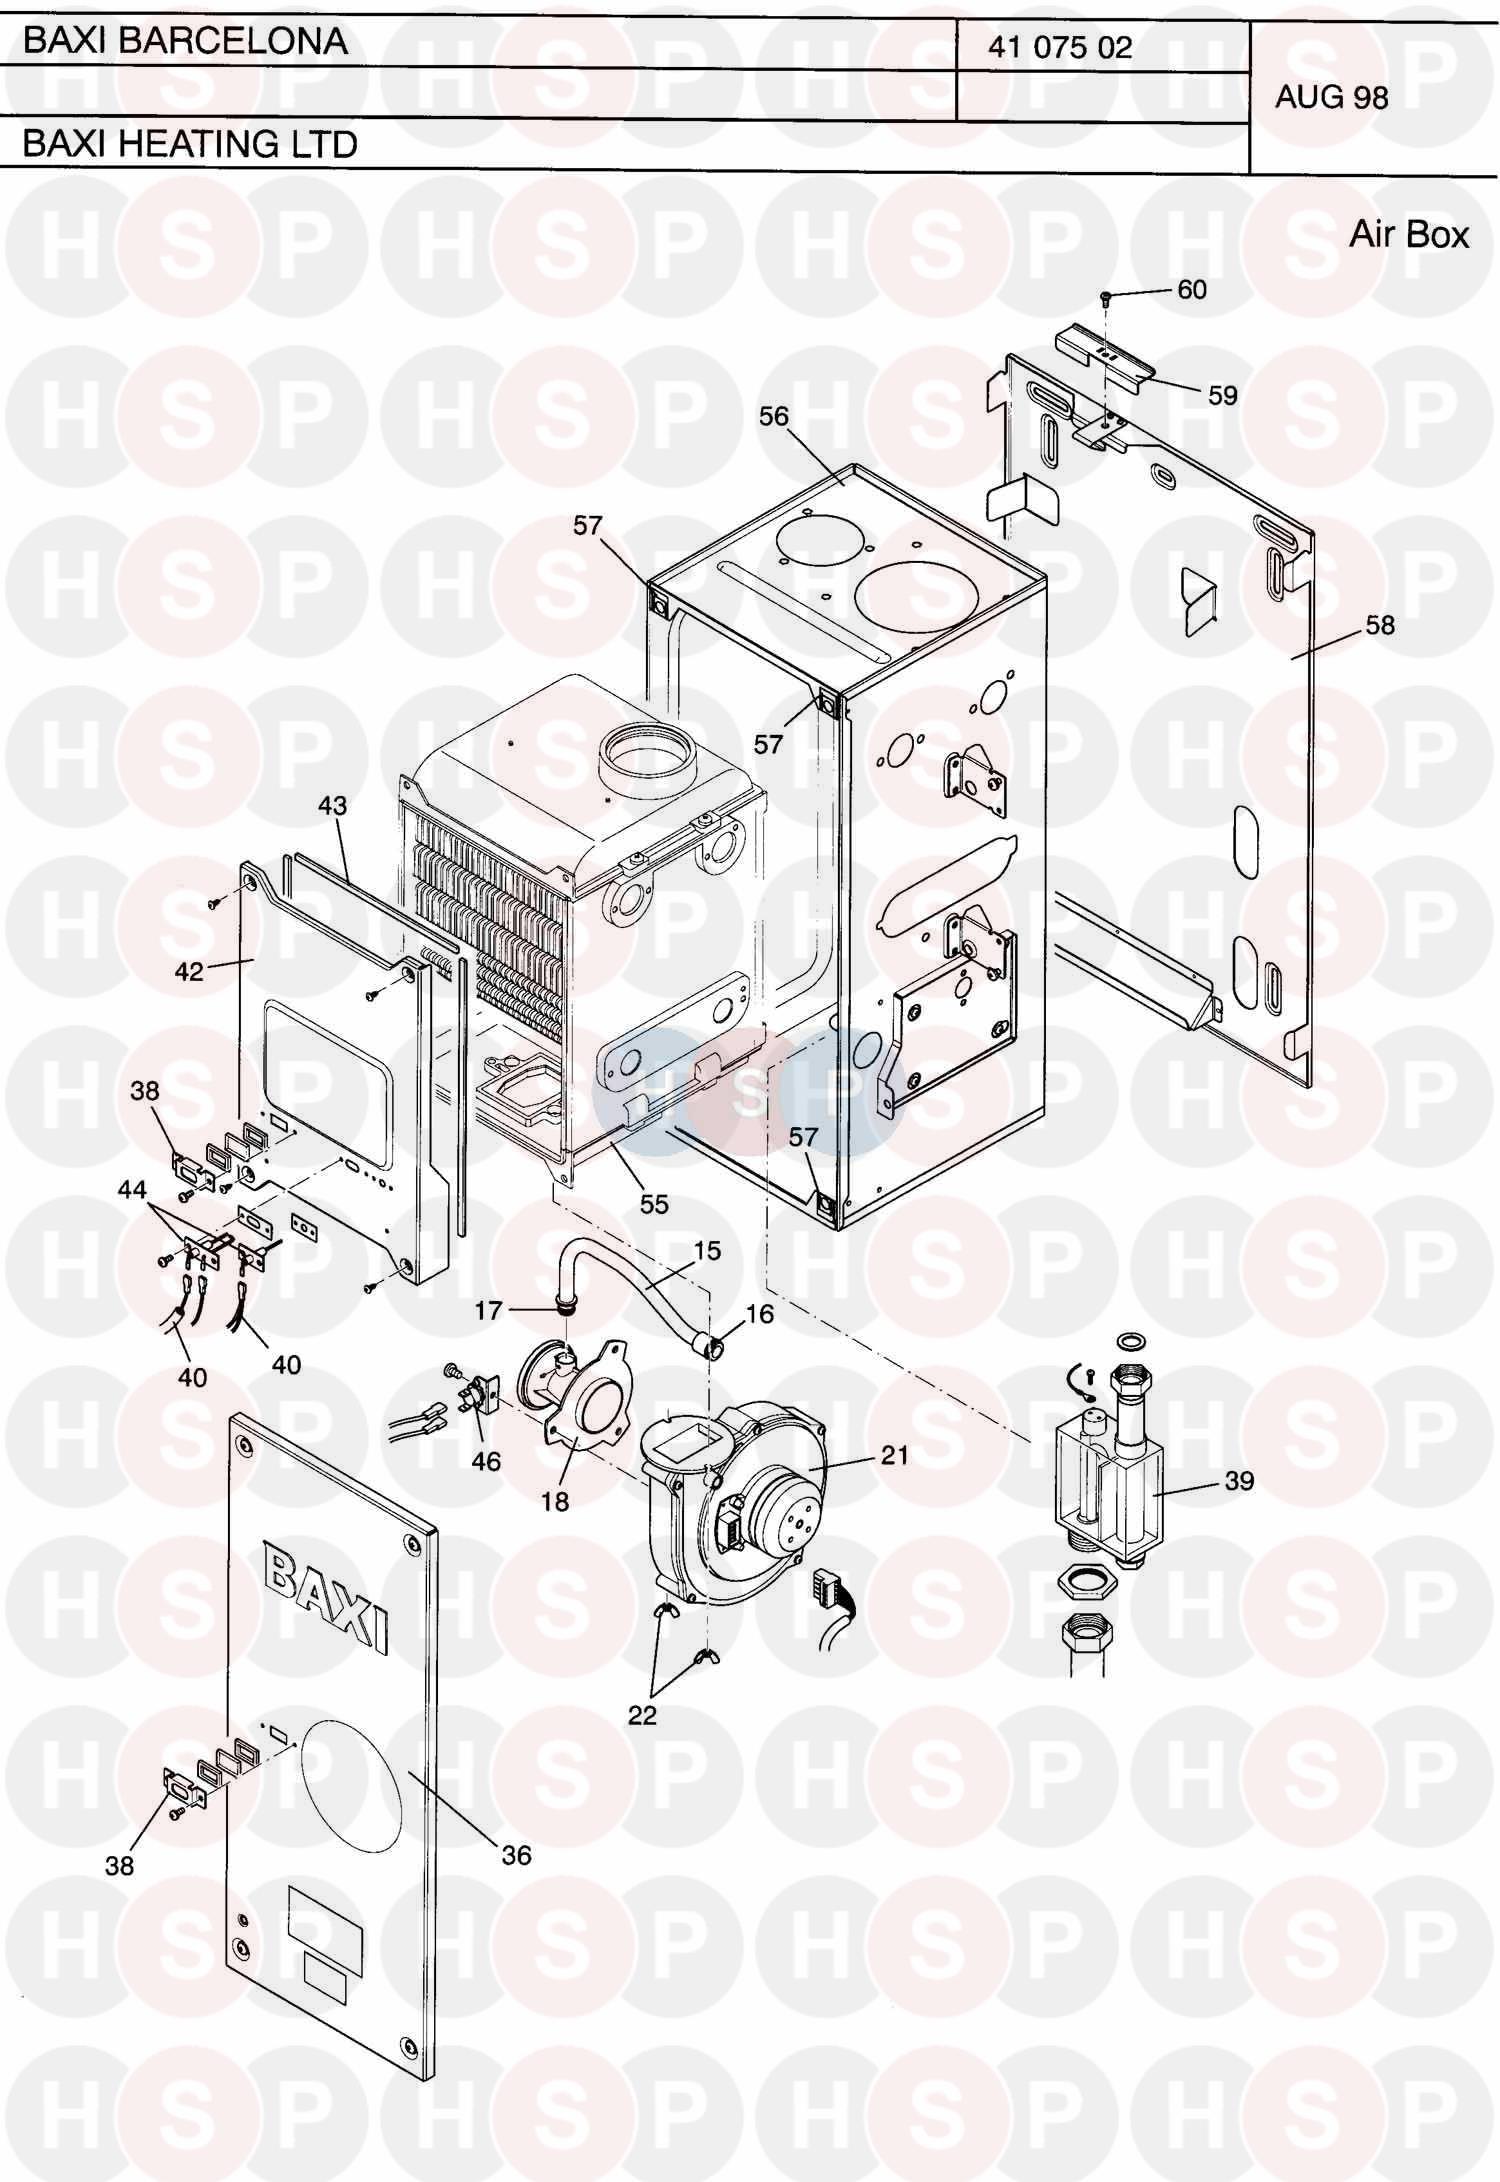 Baxi Barcelona Appliance Diagram  Air Box